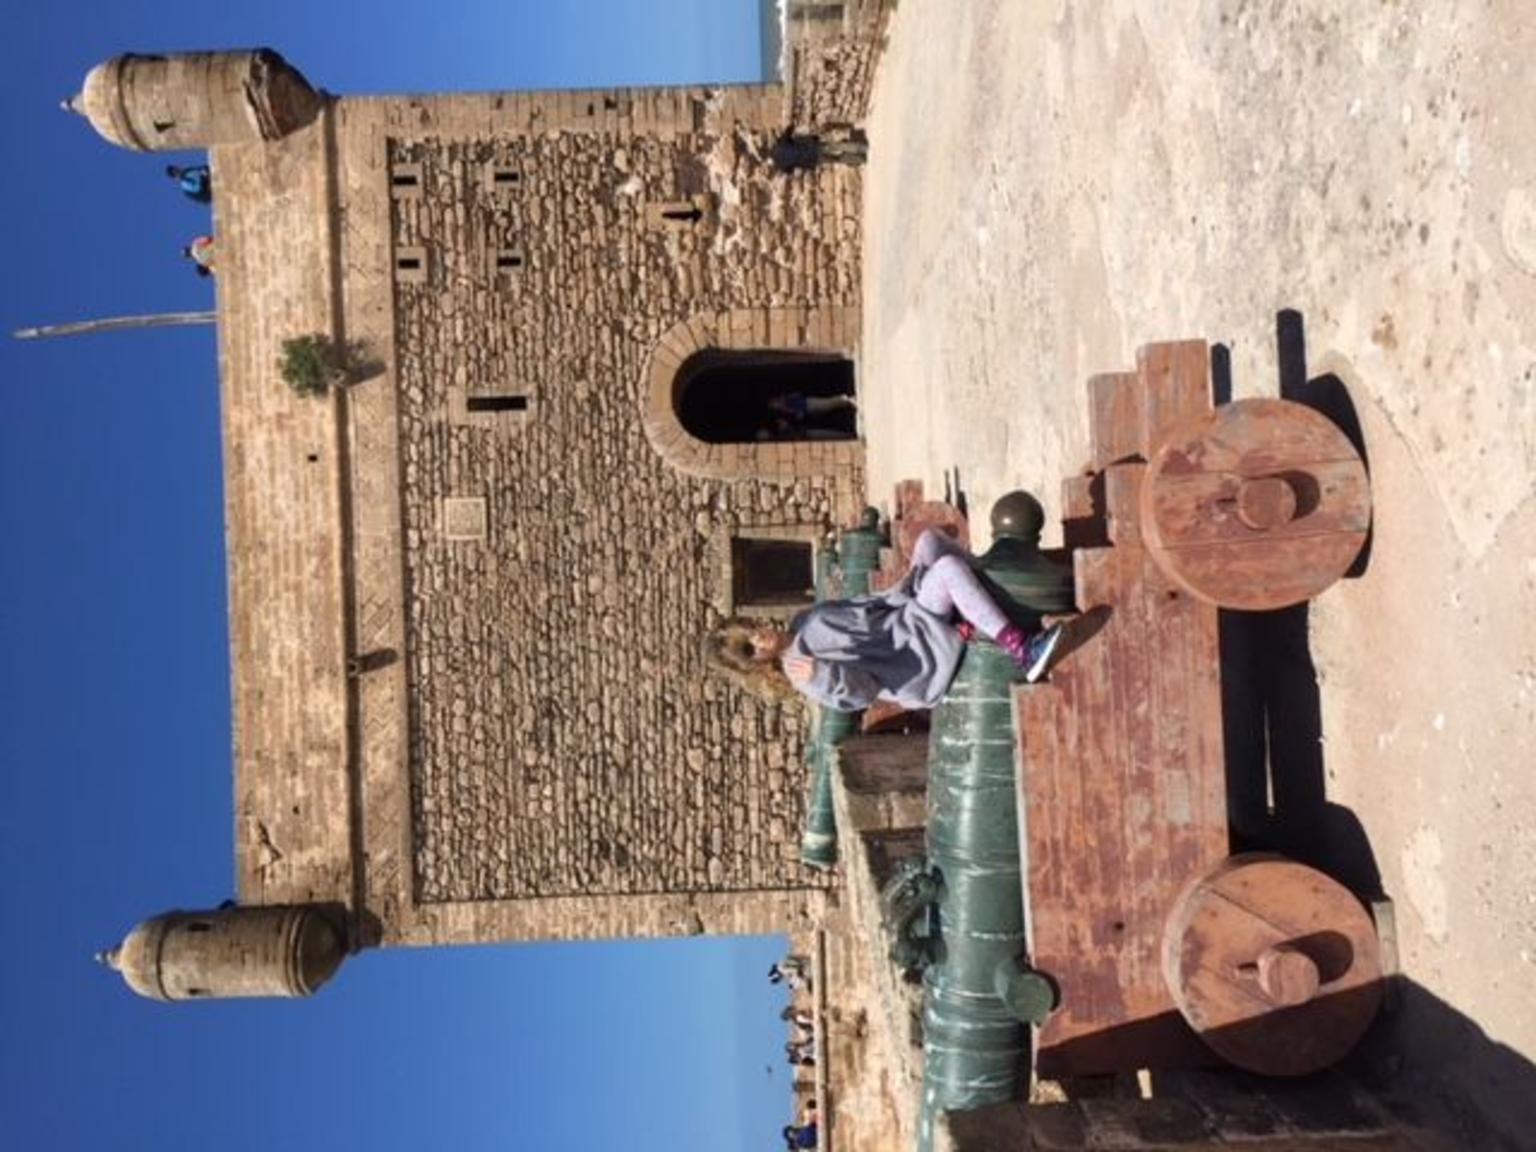 MÁS FOTOS, Full-Day Essaouira Excursion from Agadir